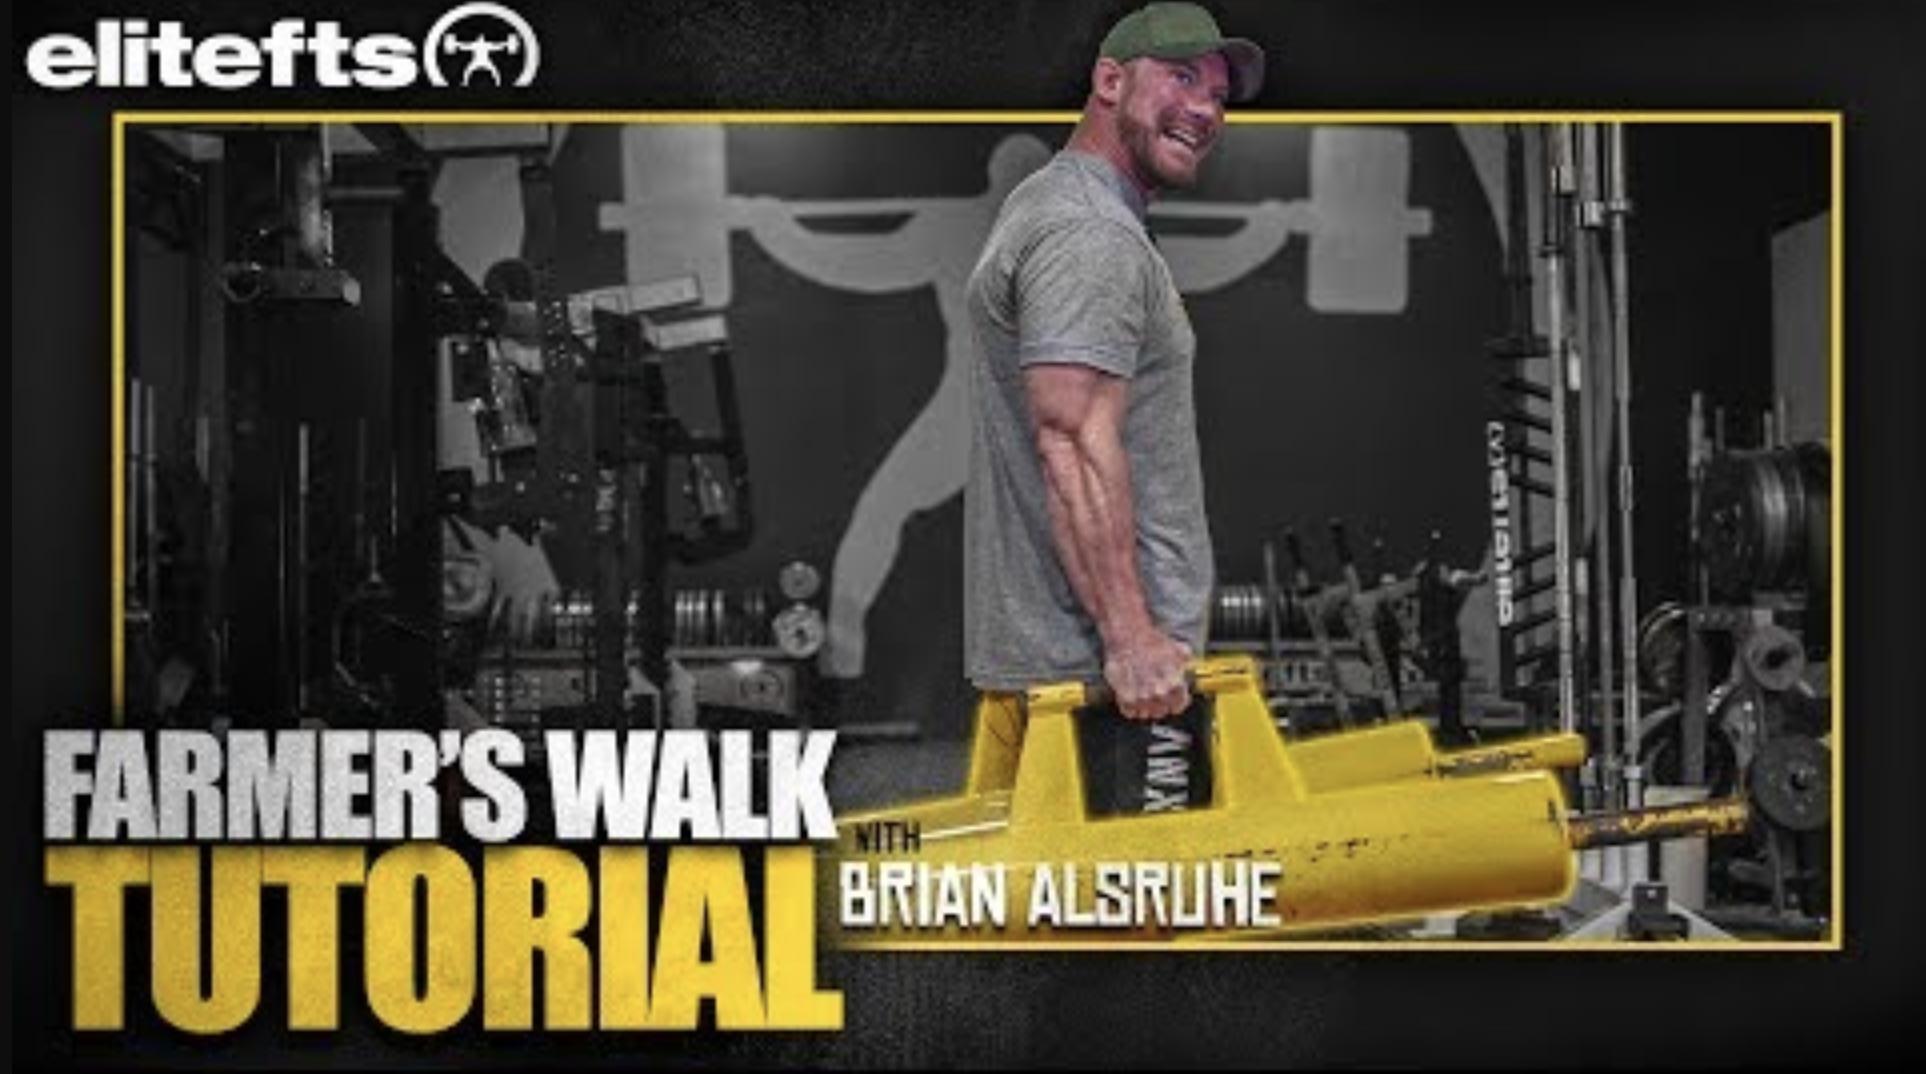 WATCH: Farmer's Walk Tutorial with Brian Alsruhe